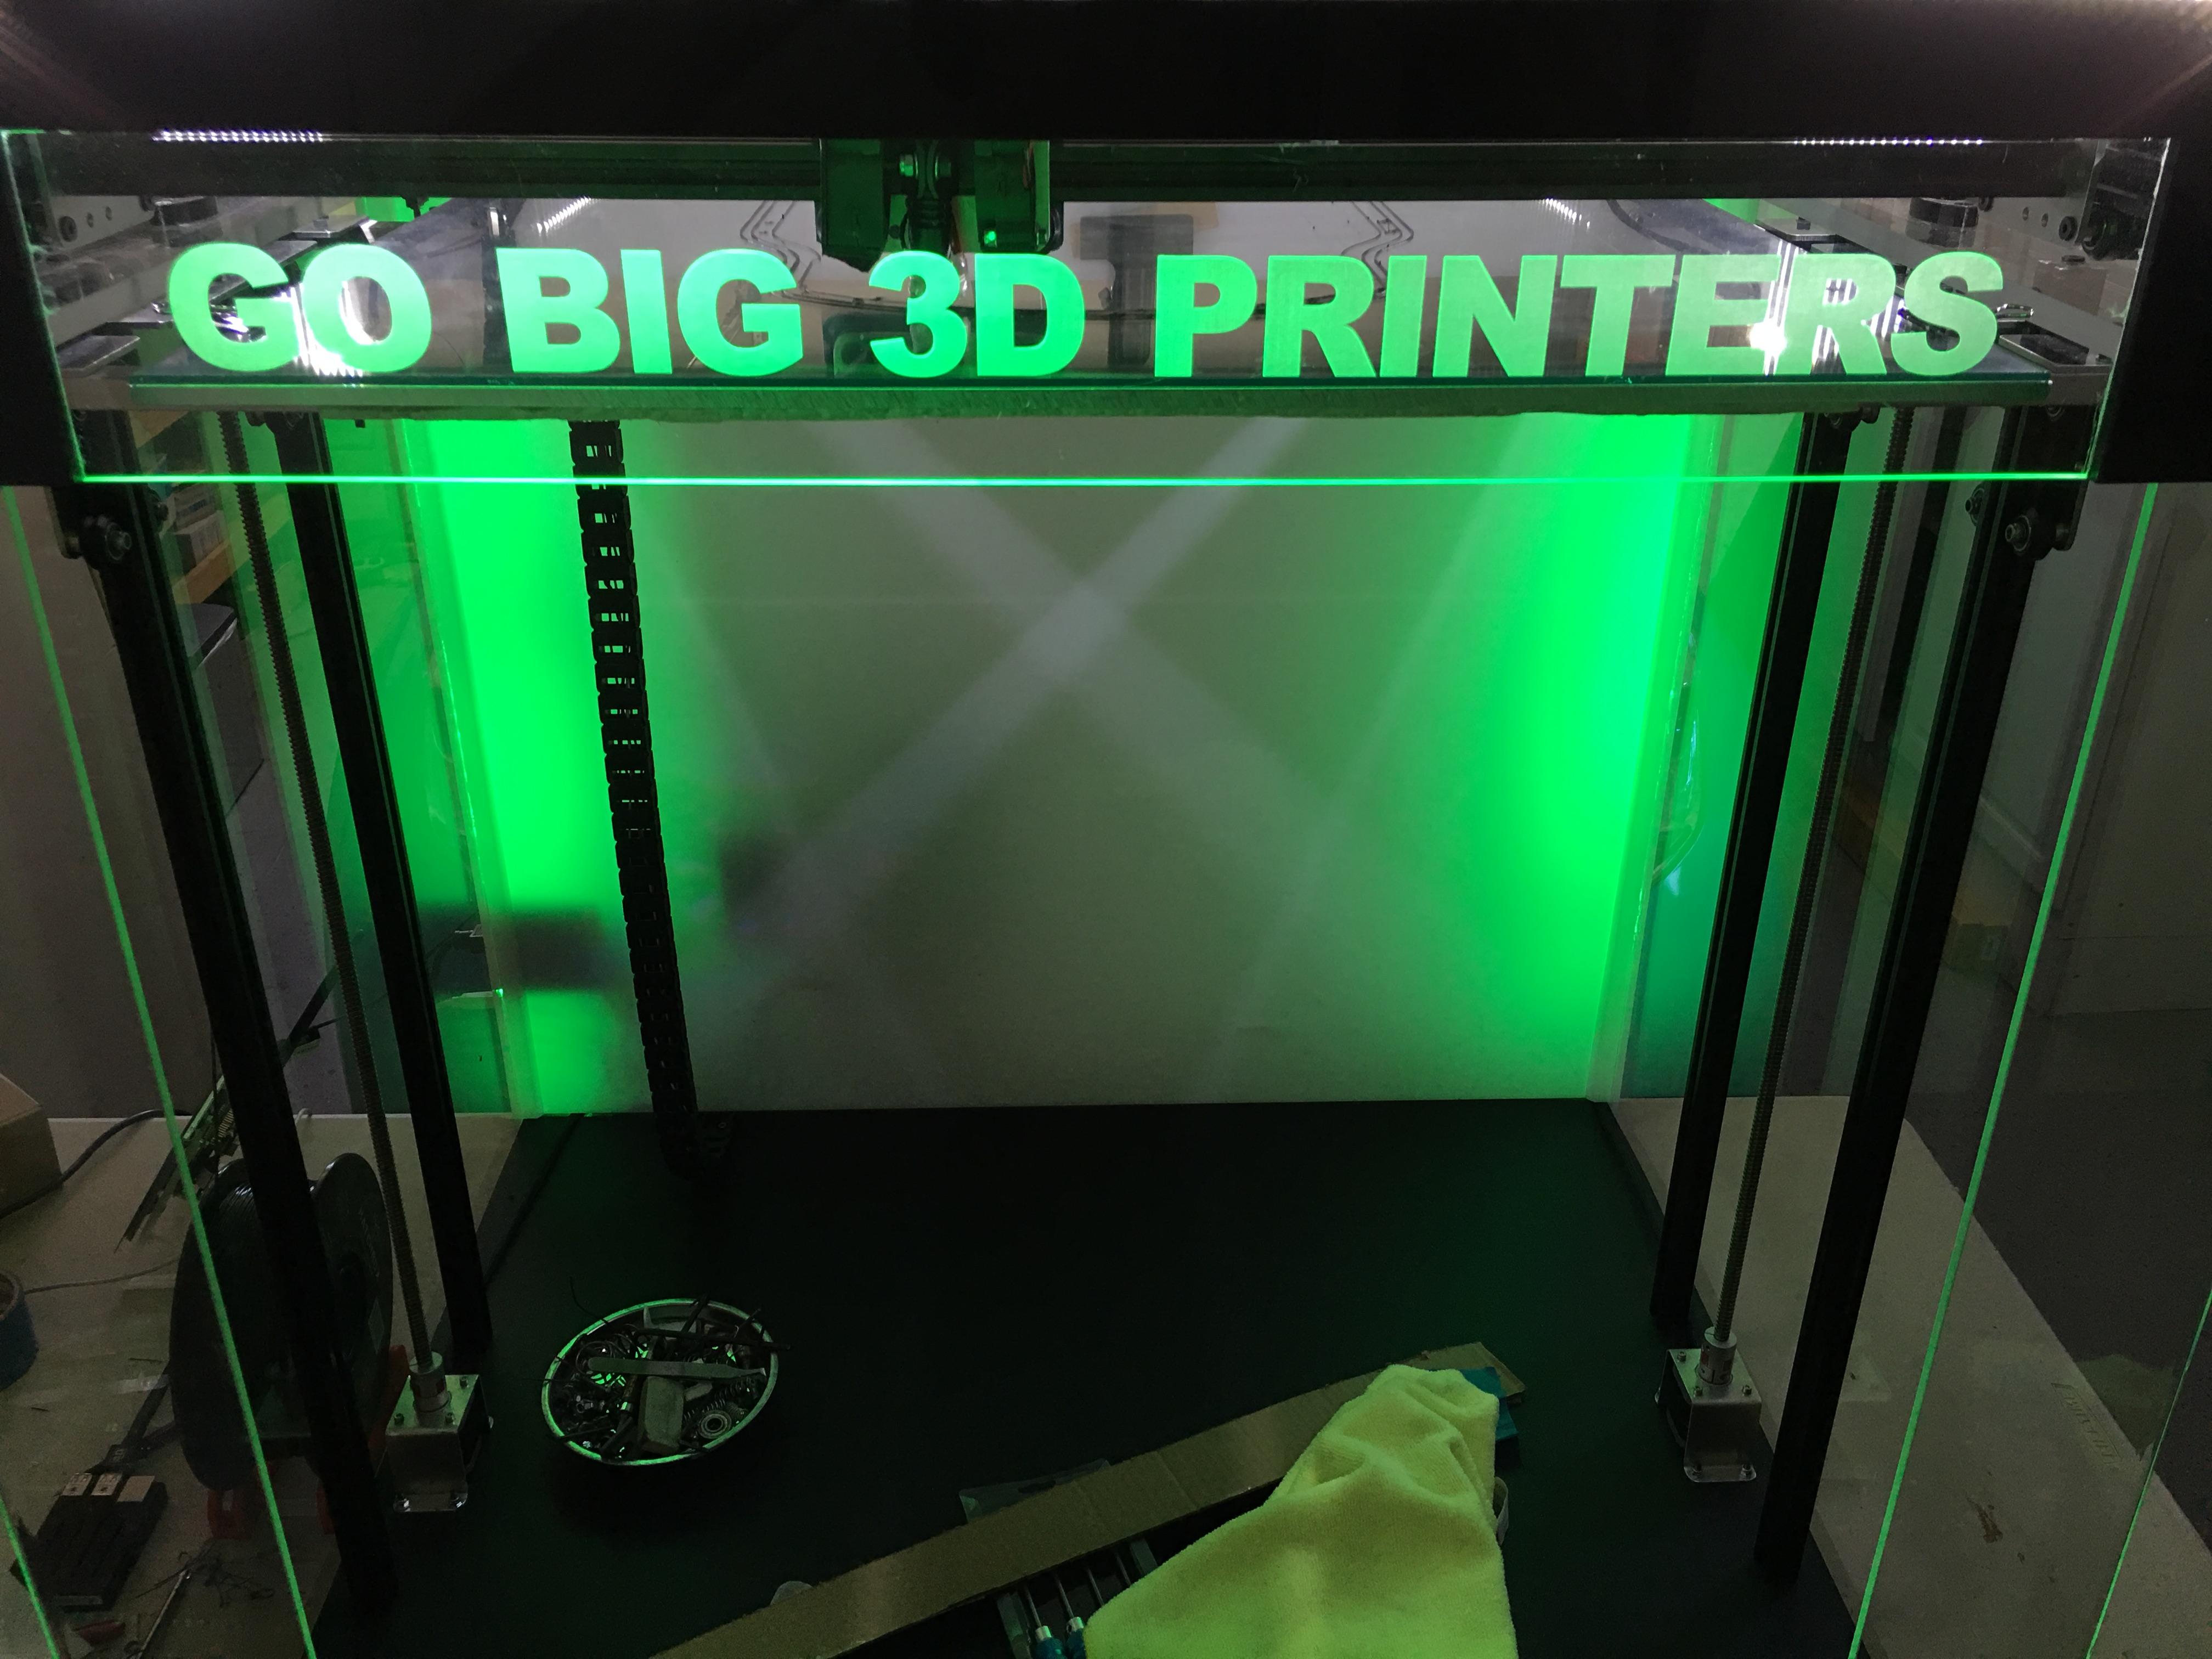 Printer_grn